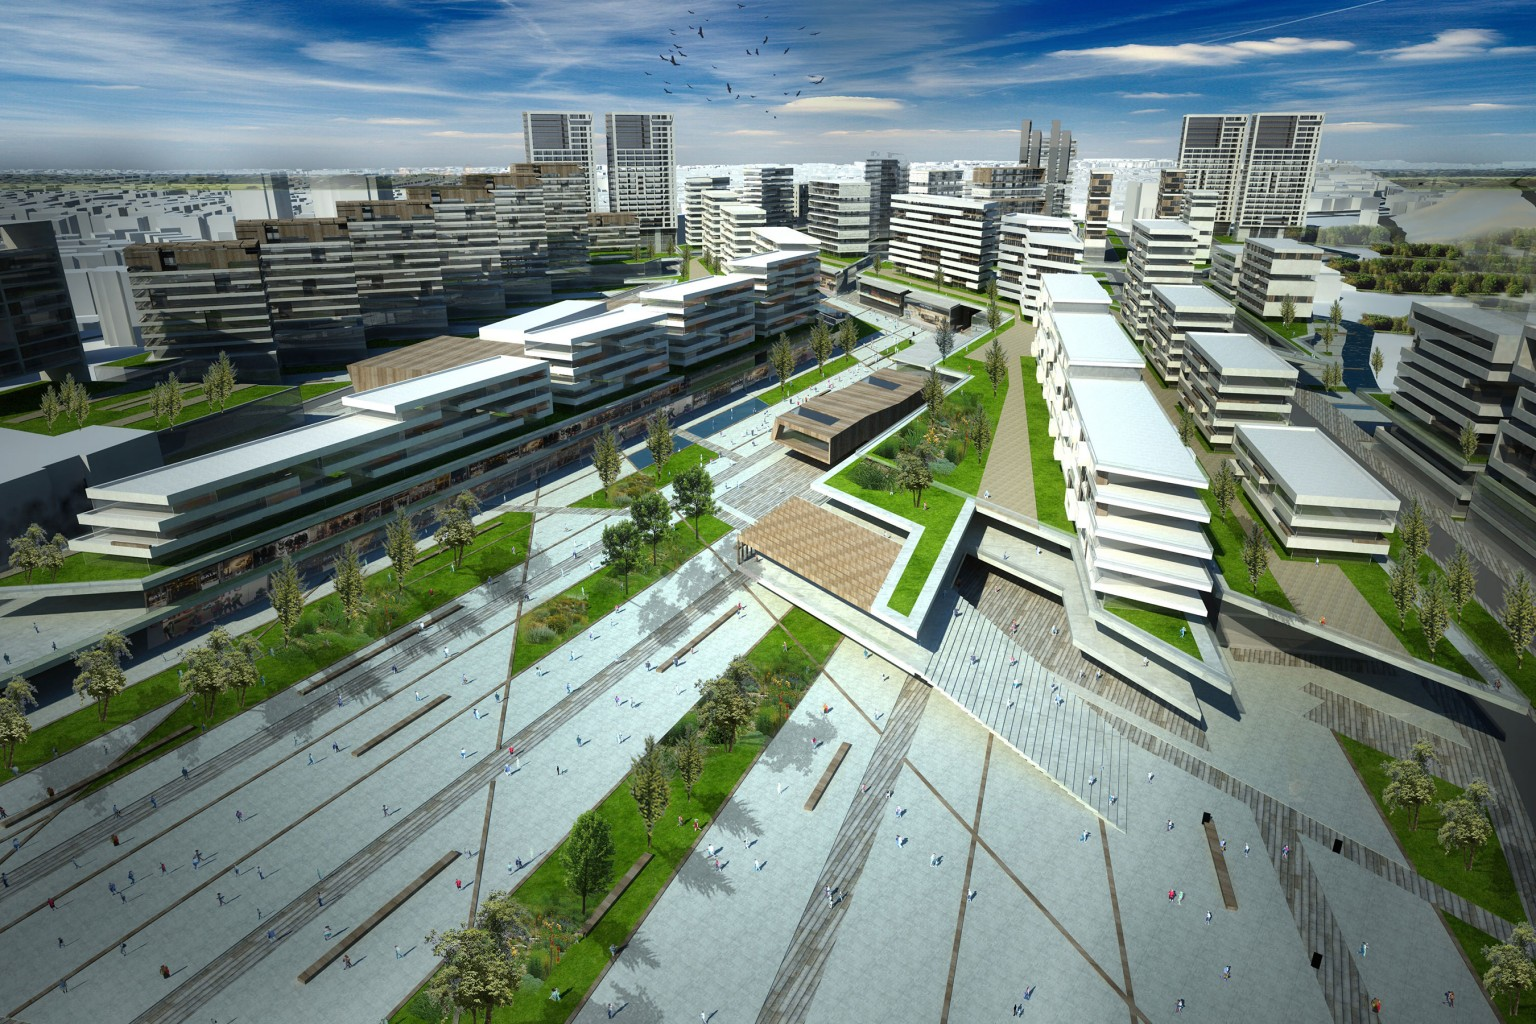 TA_TabanliogluArchitects_Dragos_Industrial_Zone_Urban_Design_Project_1